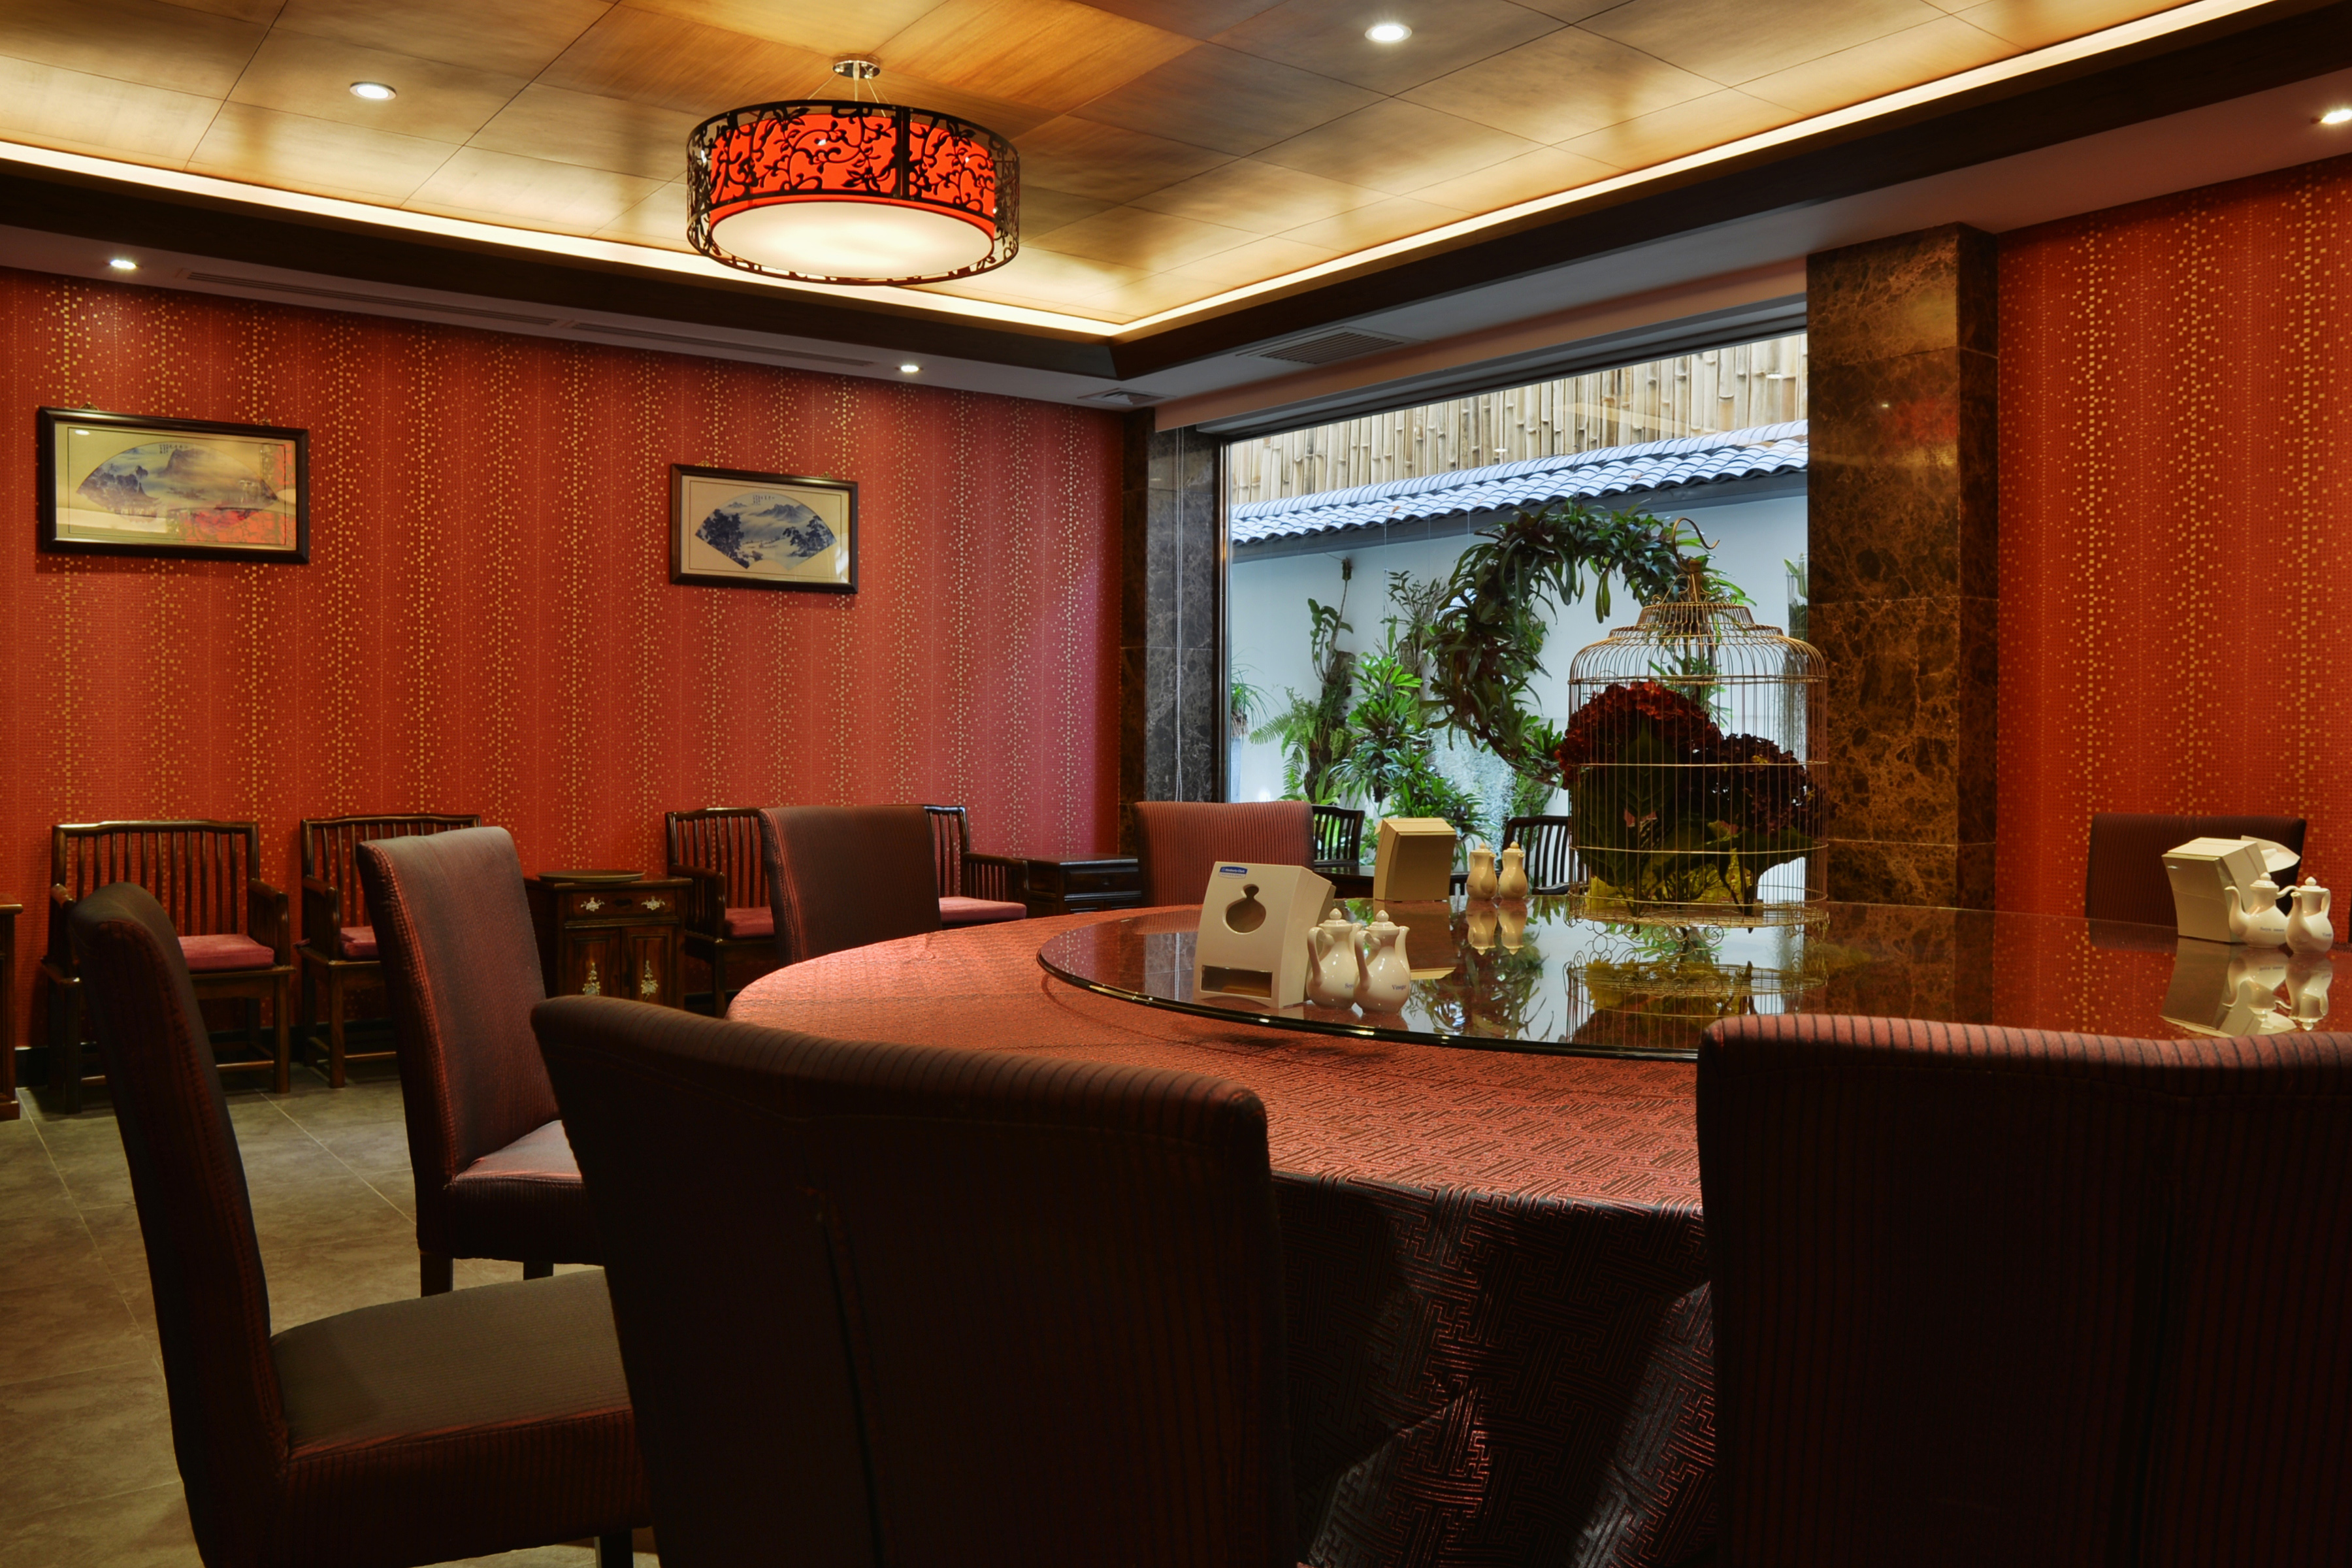 Taiming Lanpin VIP room